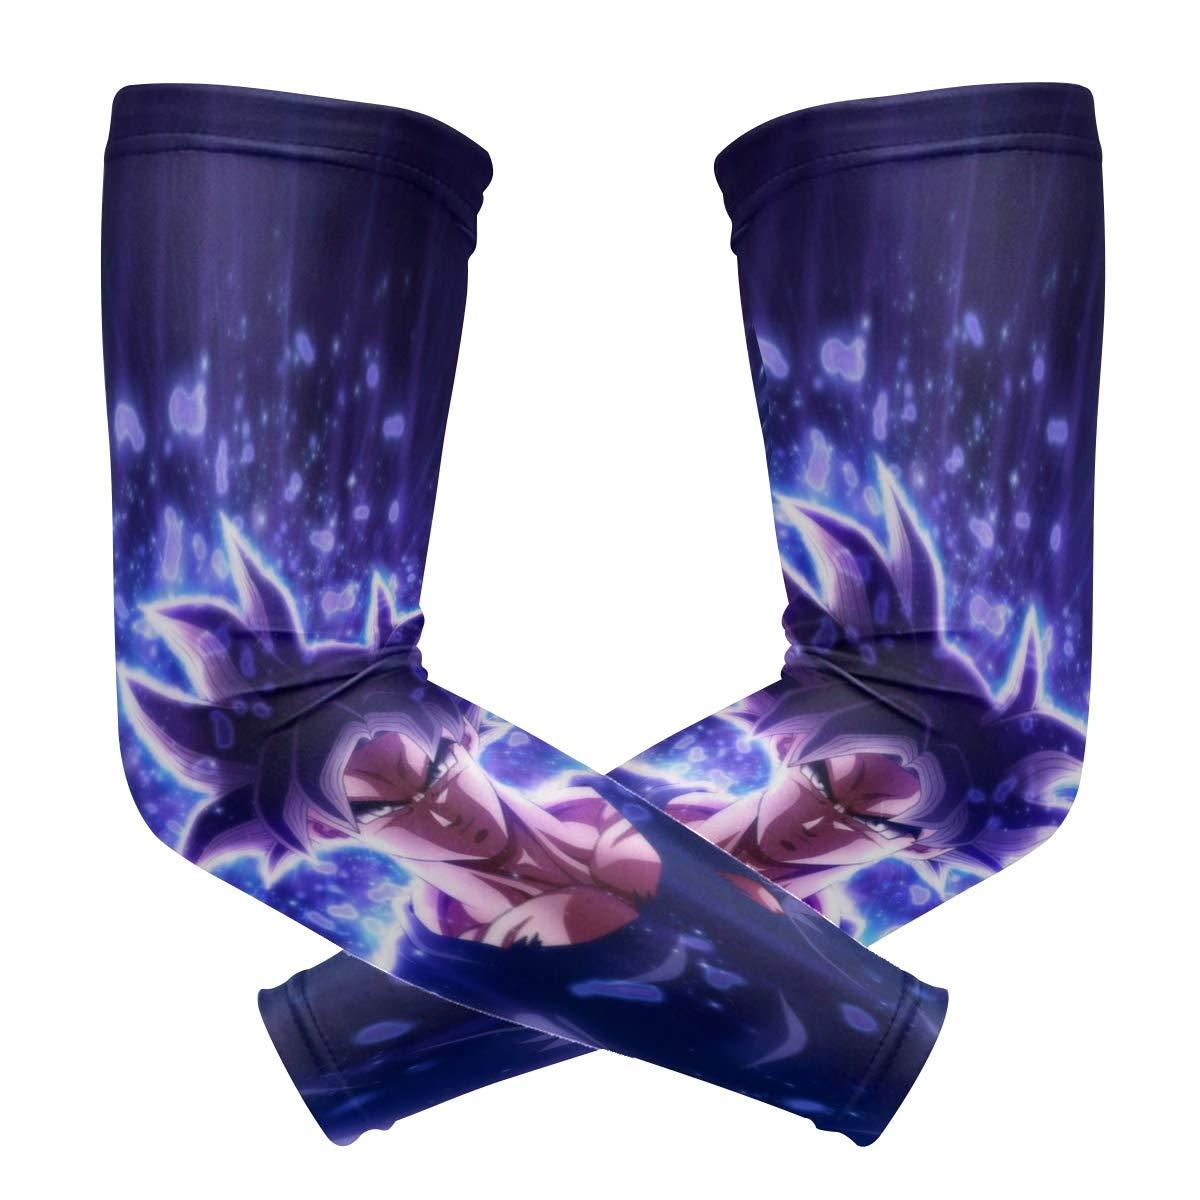 URGWSPORTS Dragon Ball Super Saiyan Migatte Gokui Ultra Instinct Key of Egoism Anime Sports Compression Arm Sleeve Unisex Moisture Wicking UV Protection